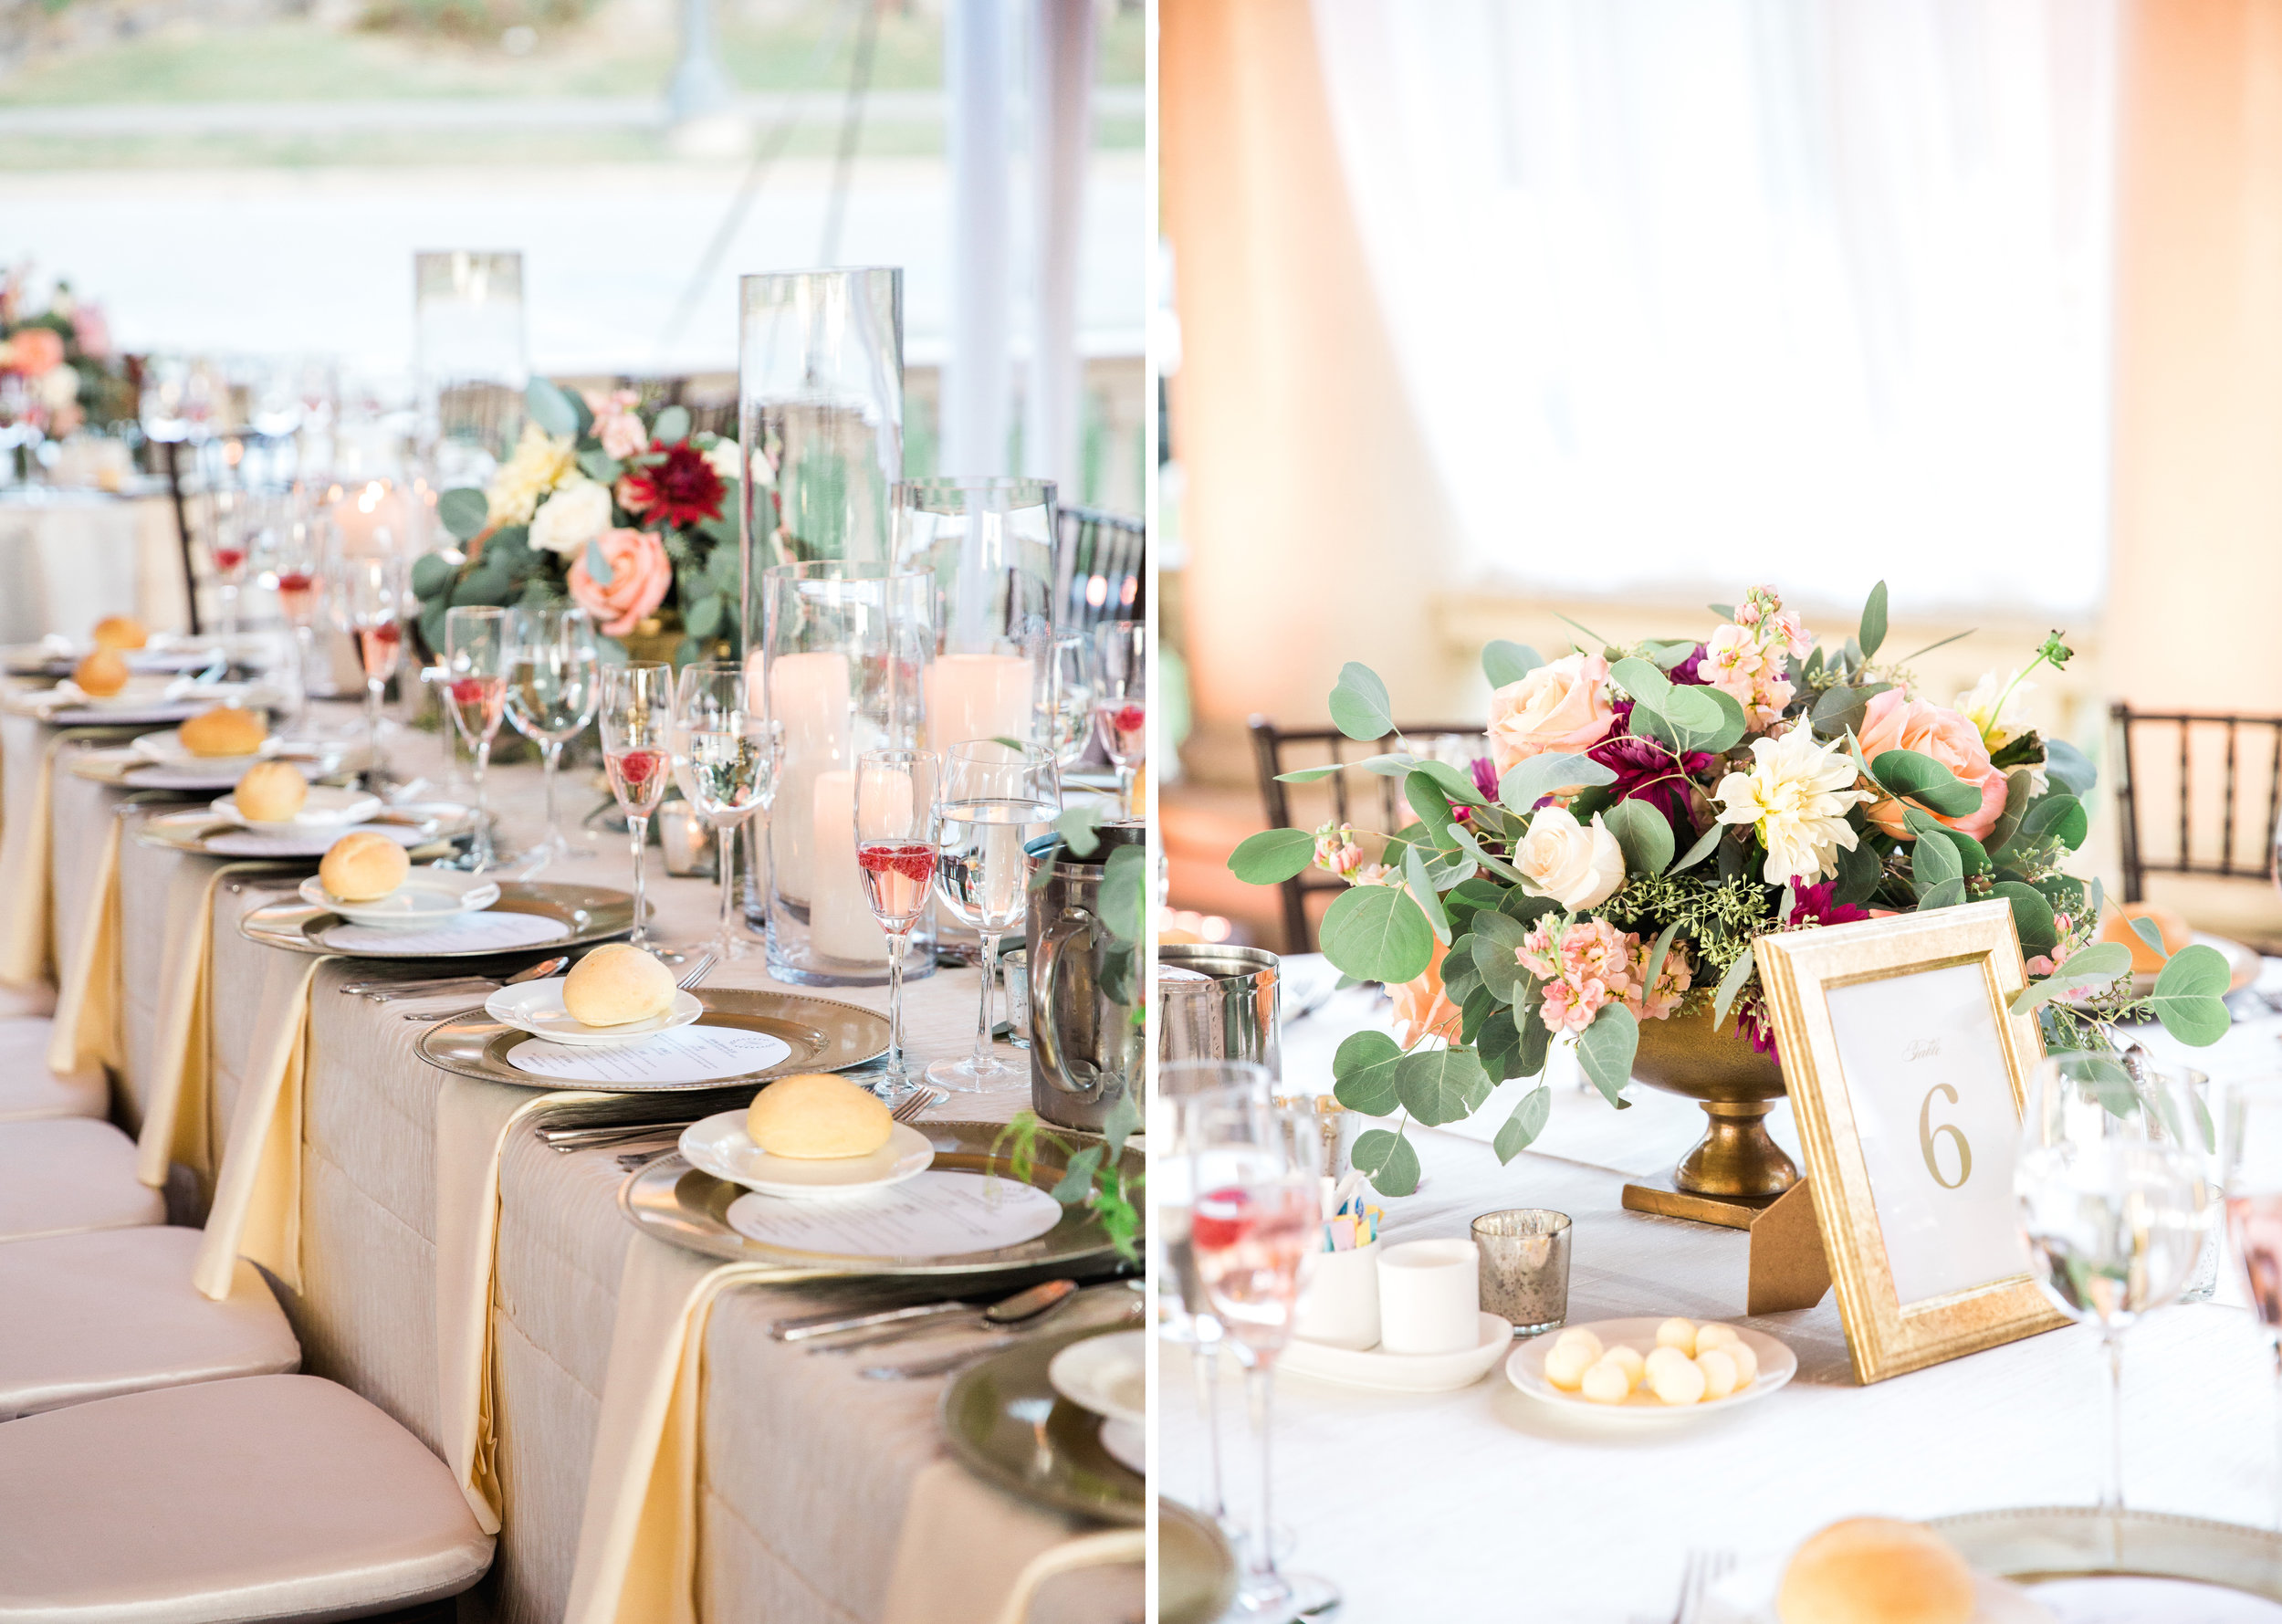 Hudson-Nichols-Black-Tie-Bride-Philadelphia-Waterworks-Wedding-Cescaphe-Reception-Floral-Details32.jpg